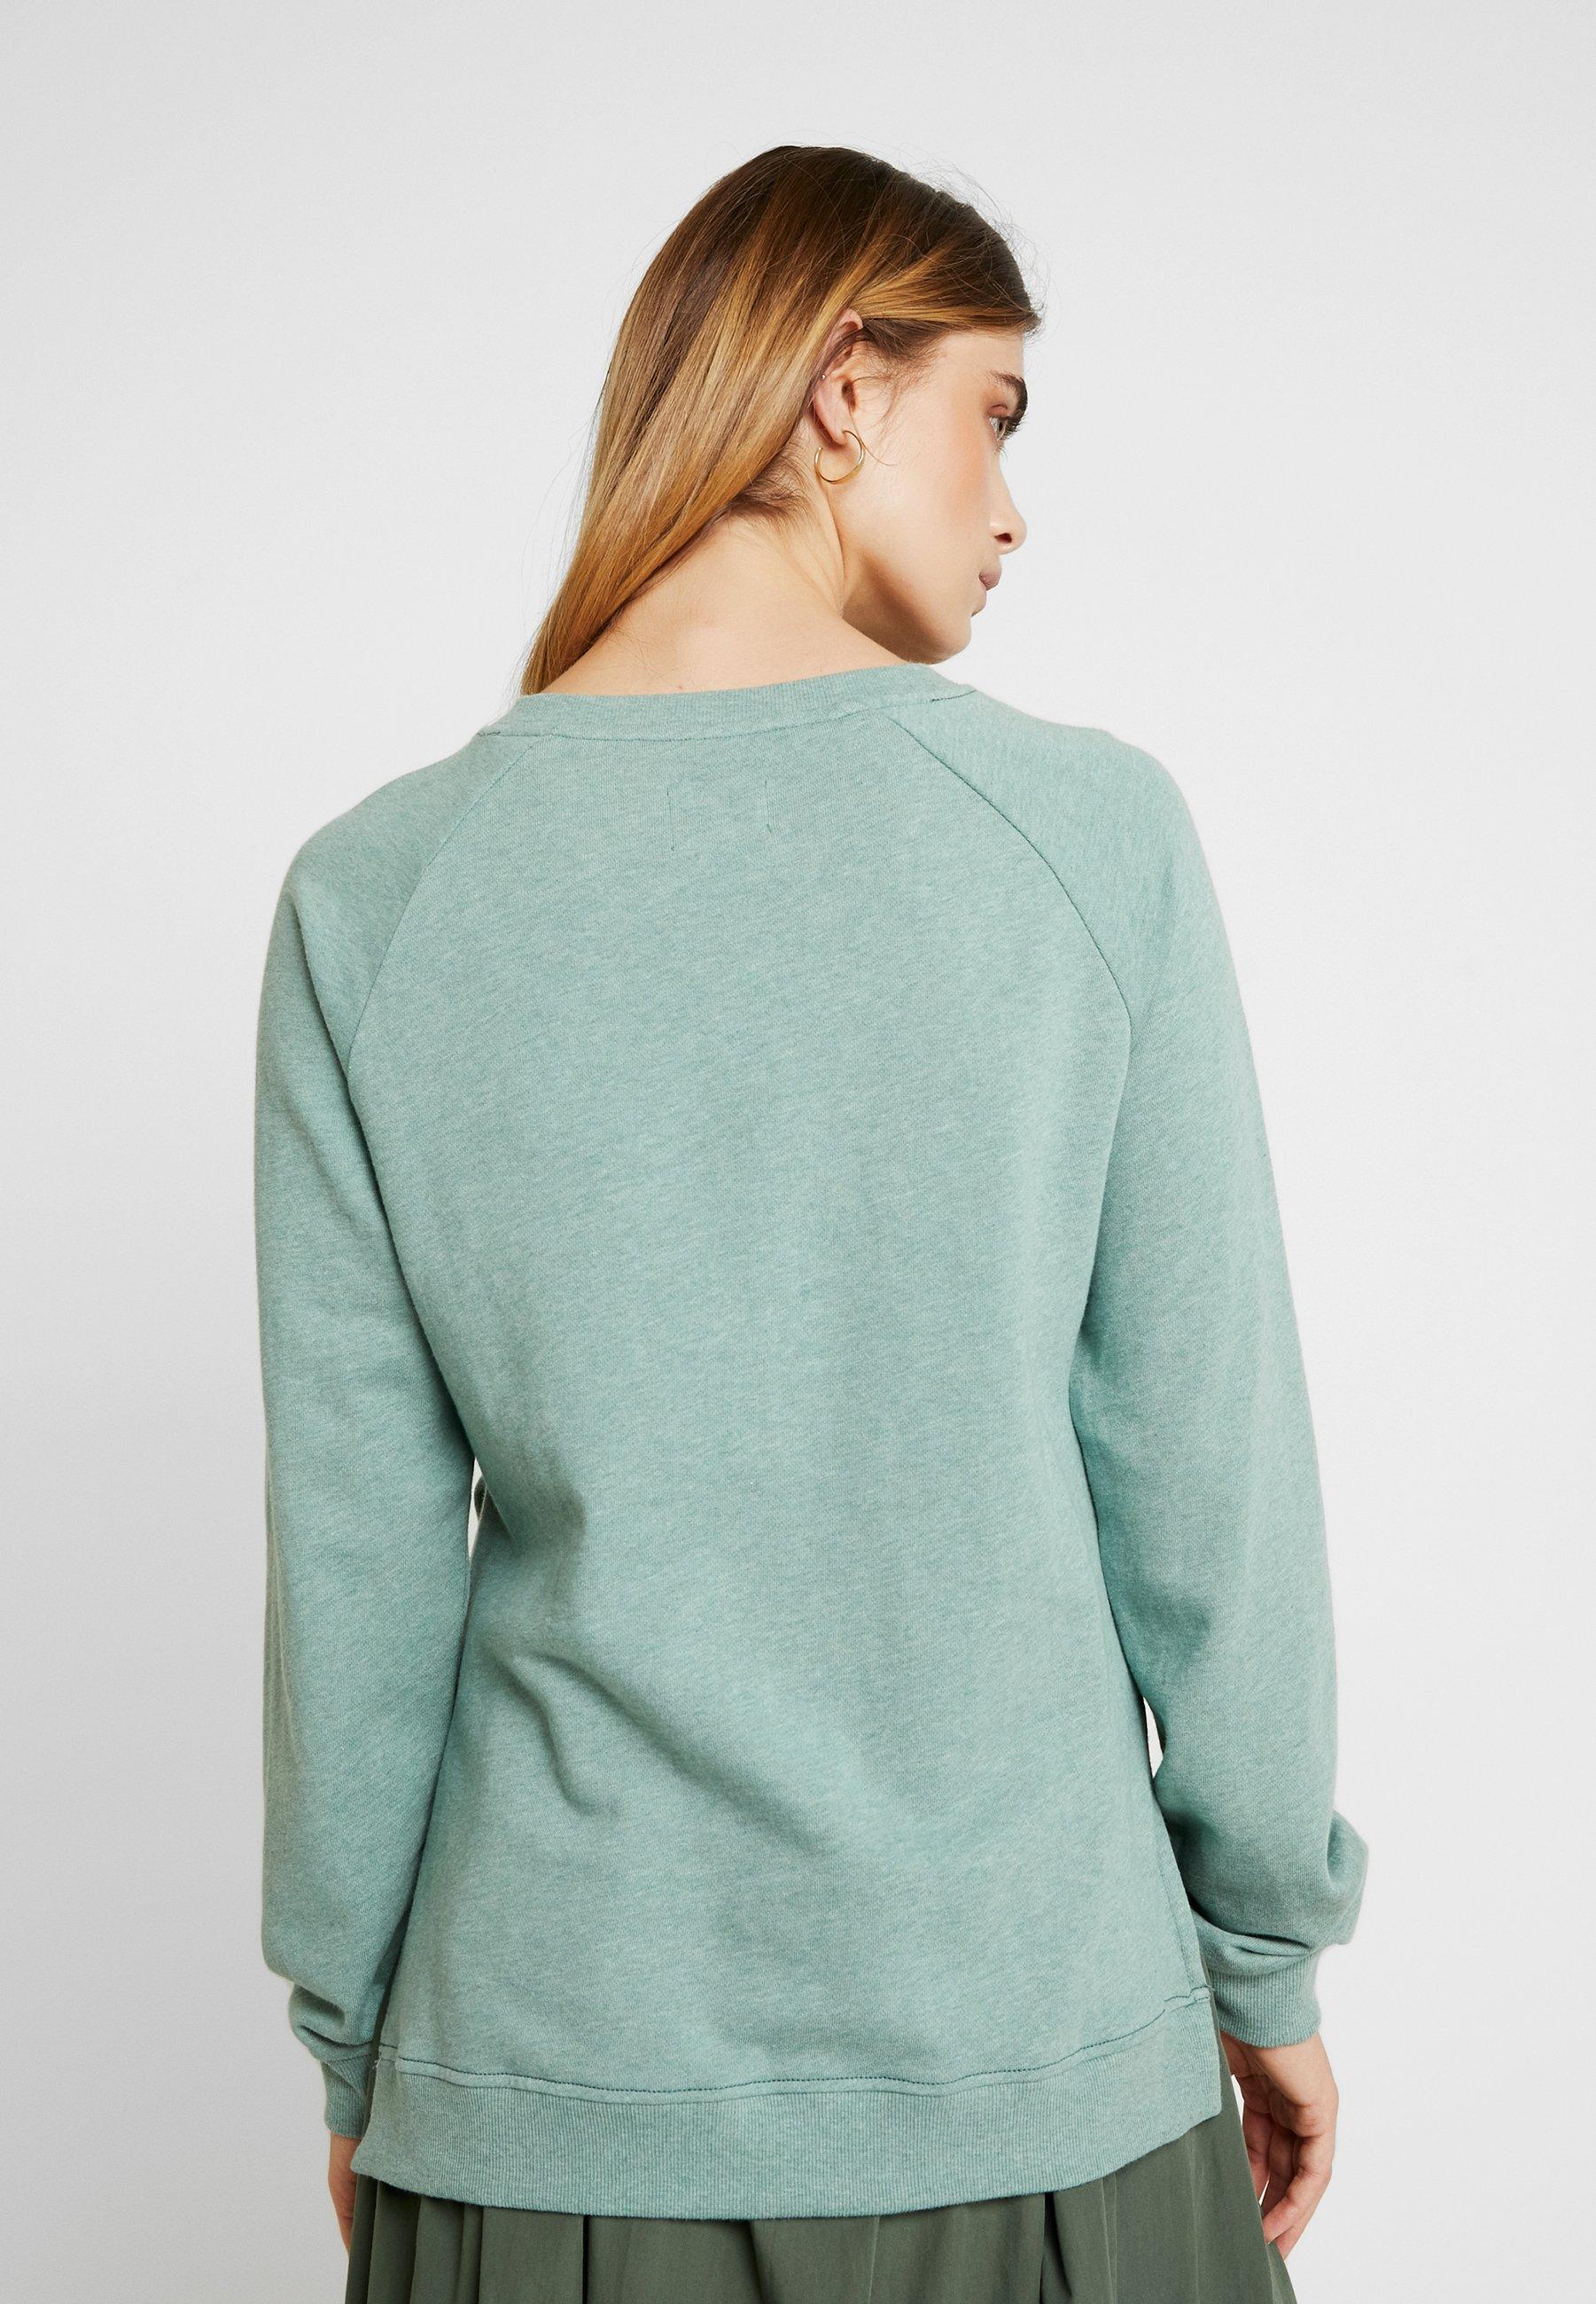 Green RaglanSweatshirt Esmé Sofie Mottled Studios Nw8Omyvn0